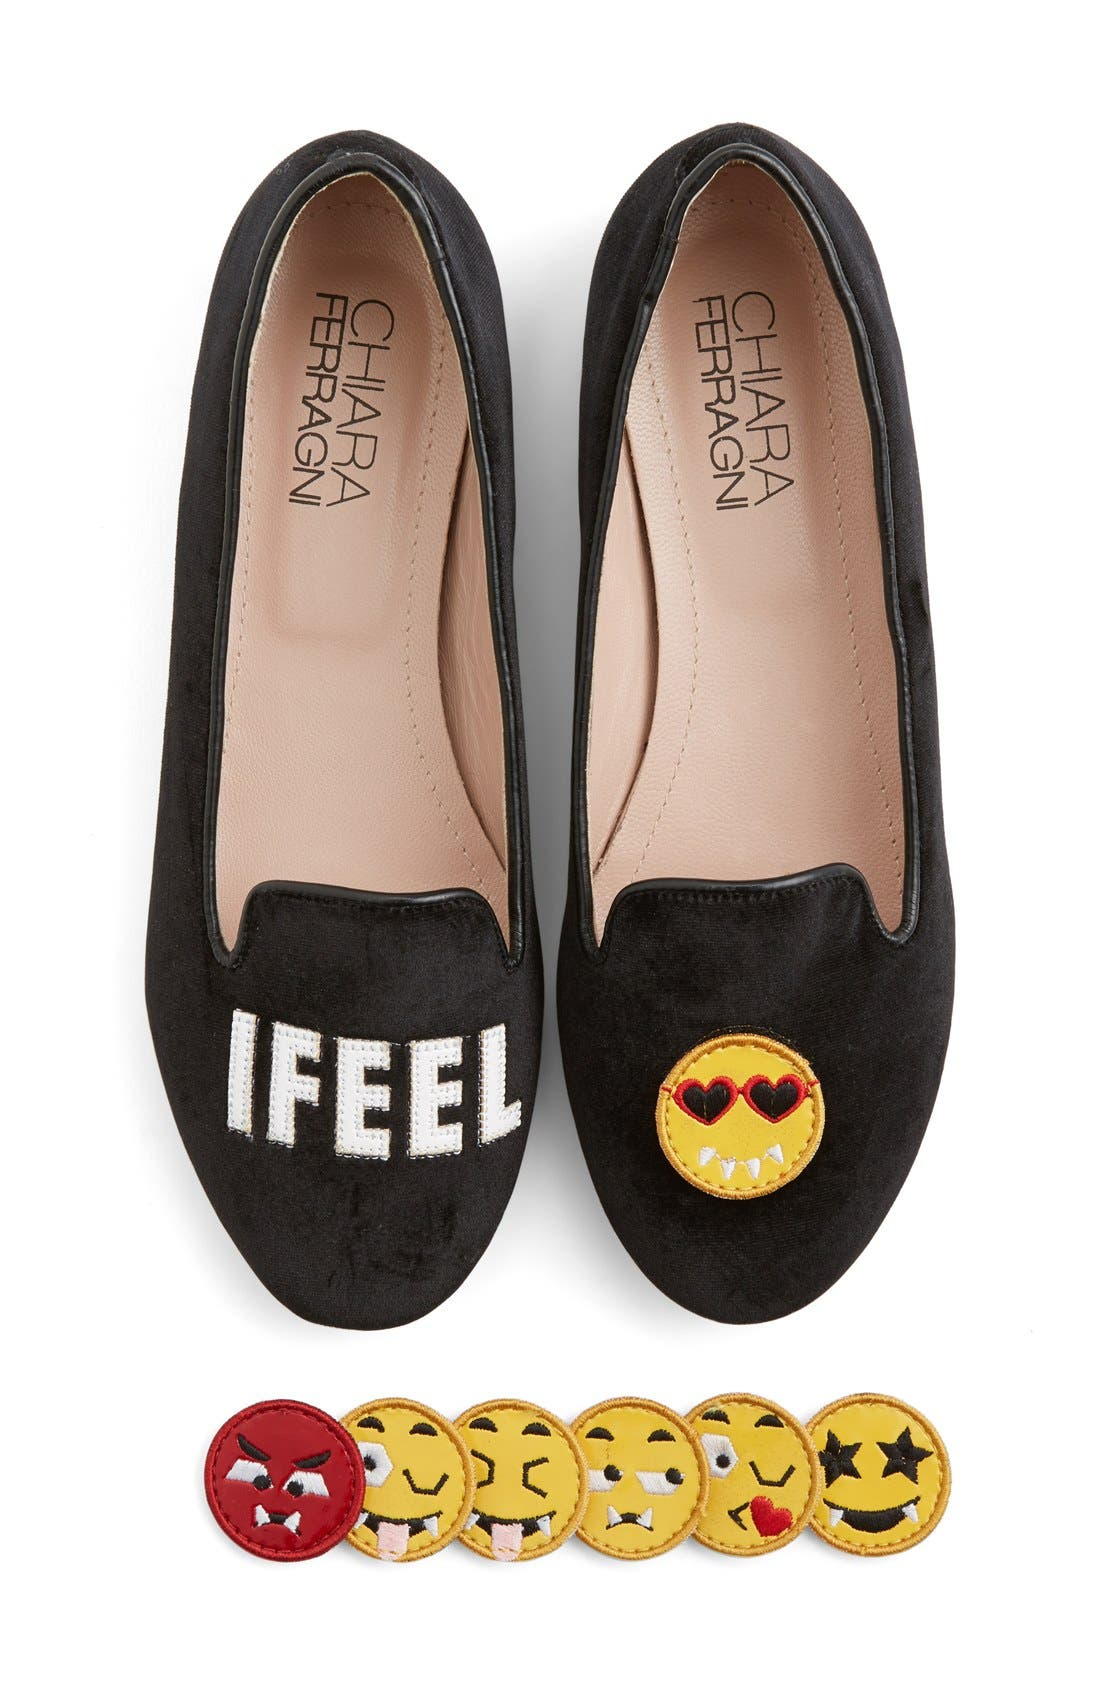 Alternate Image 1 Selected - ChiaraFerragni'I Feel' Flat (Women)